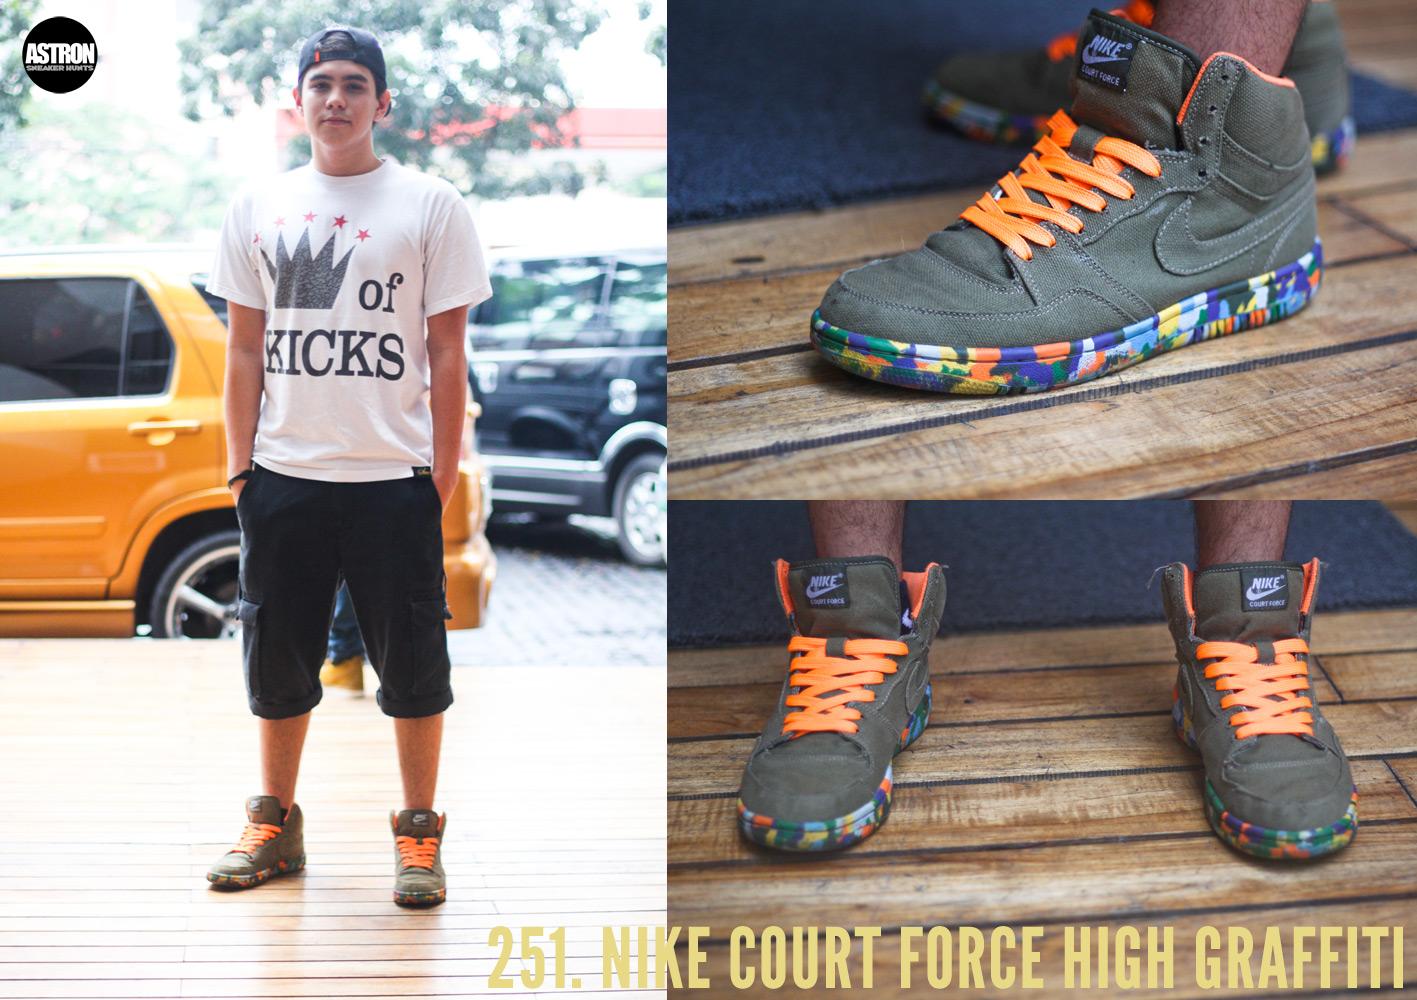 nike free run grise - Astron Sneaker Hunts: 251. Nike Court Force High Graffiti